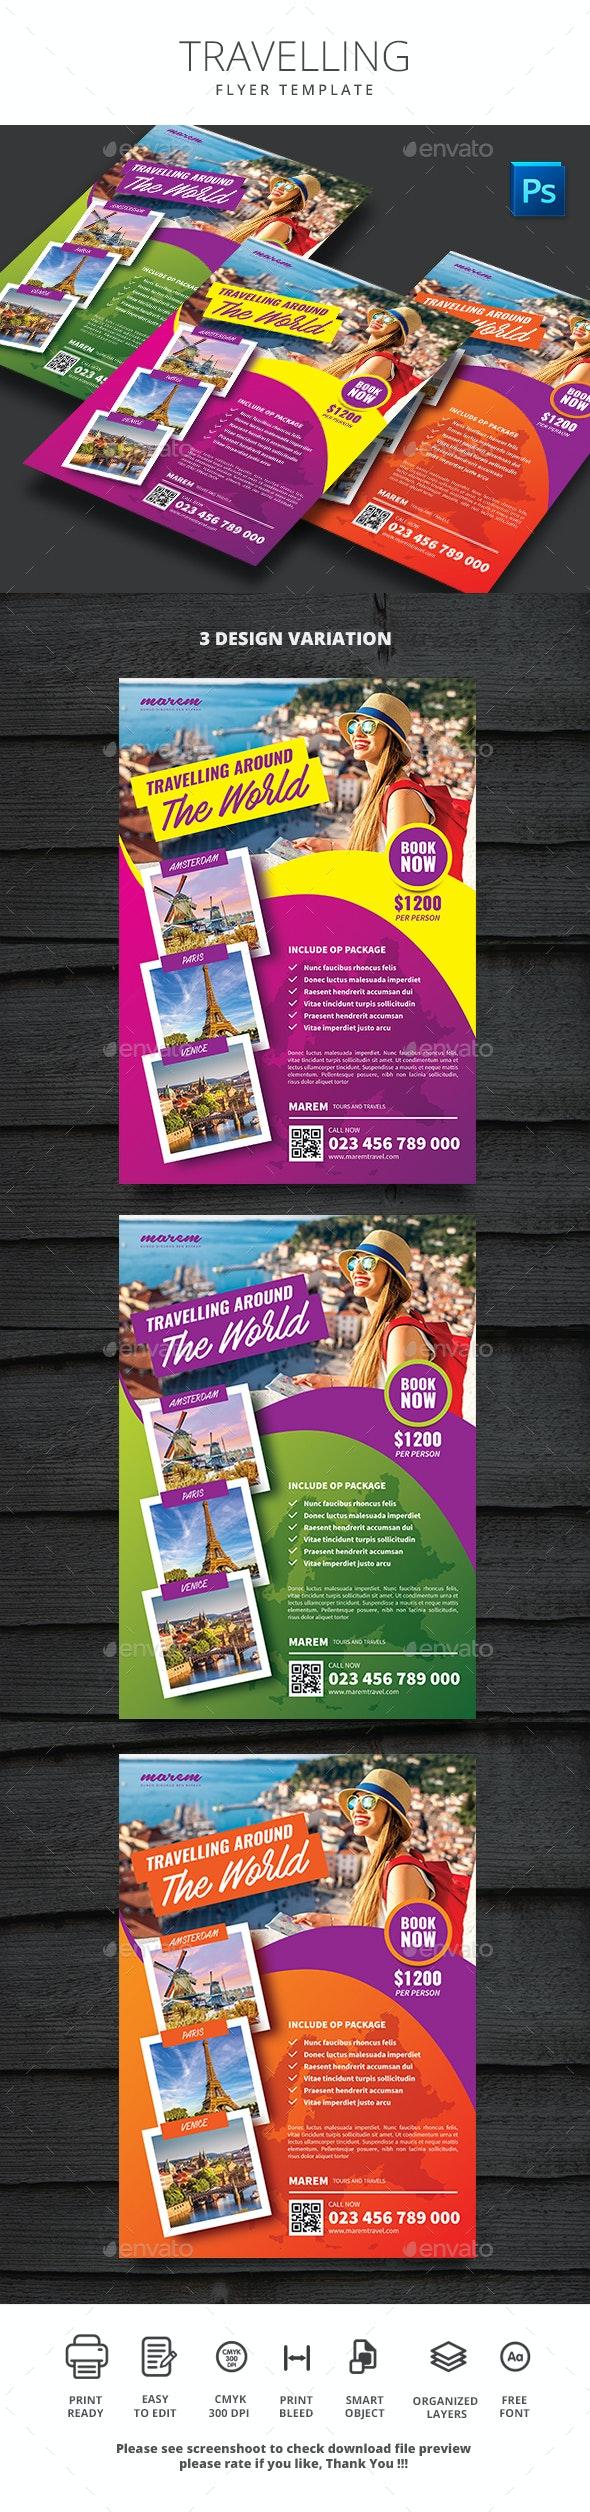 Travel - Holidays Events